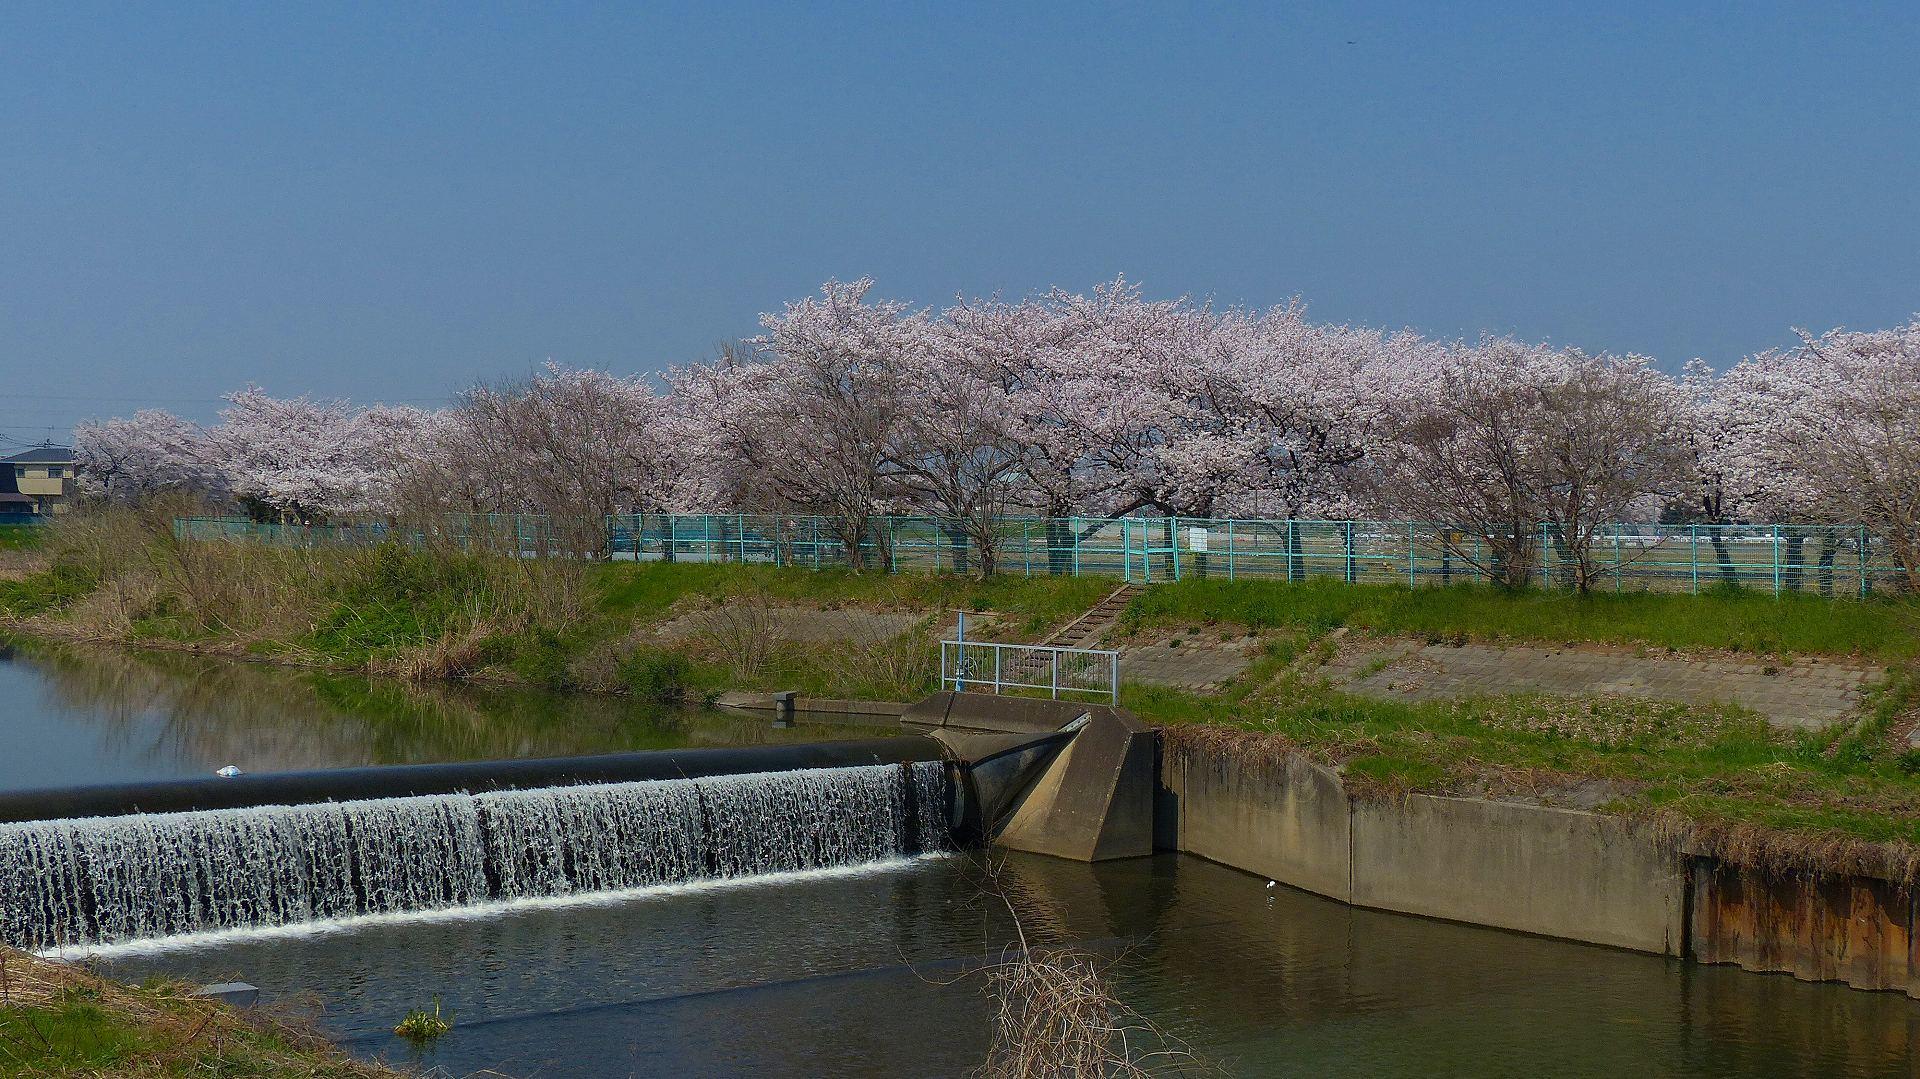 満開の桜を堪能! 【 2018 3/28(水) 】_a0185081_19282942.jpg